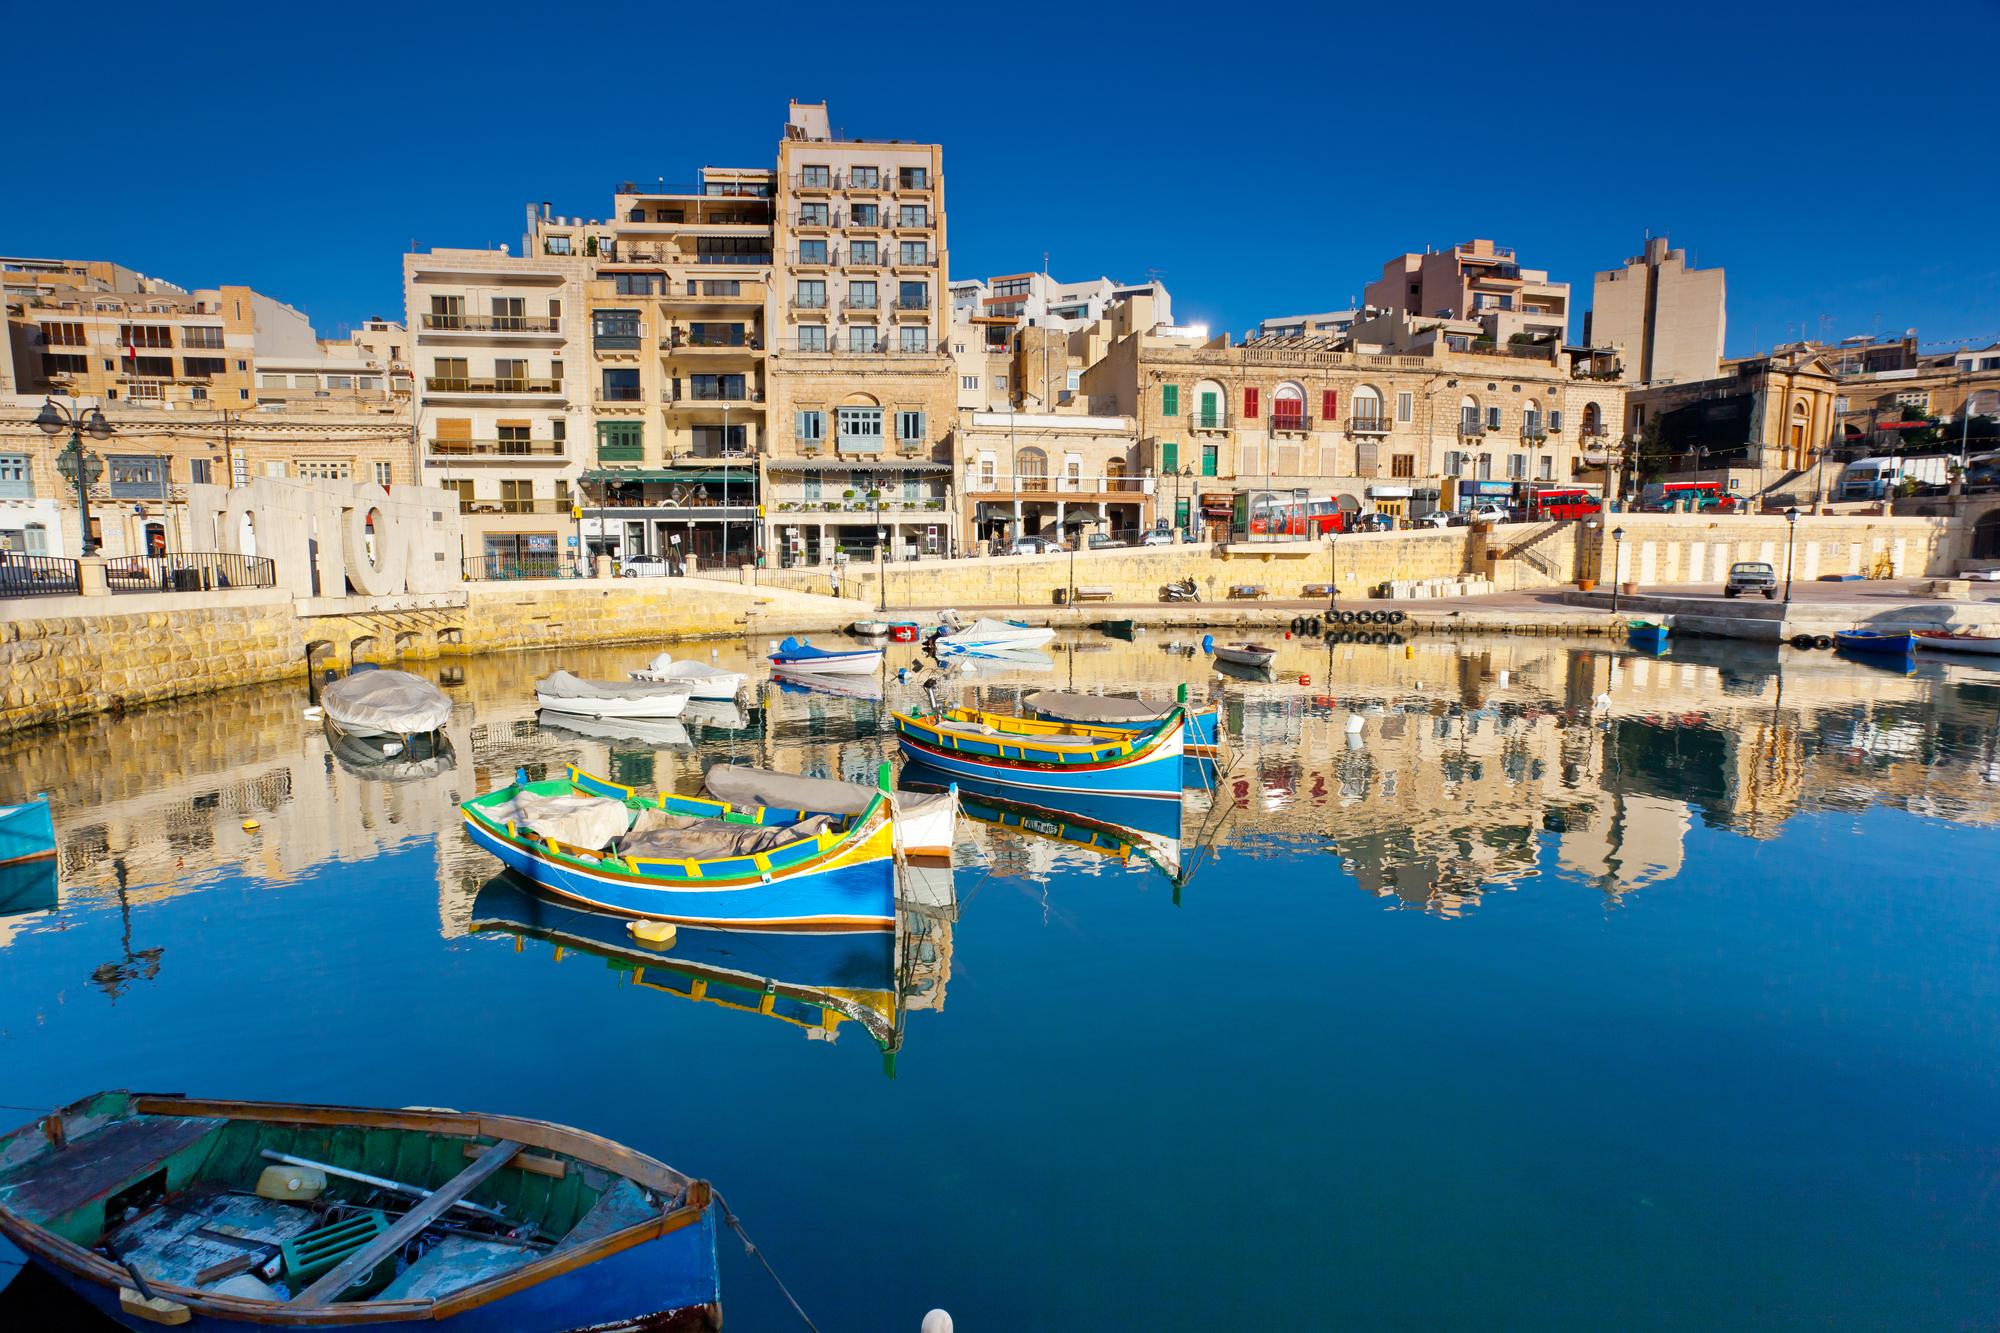 The Palace Hotel Malta